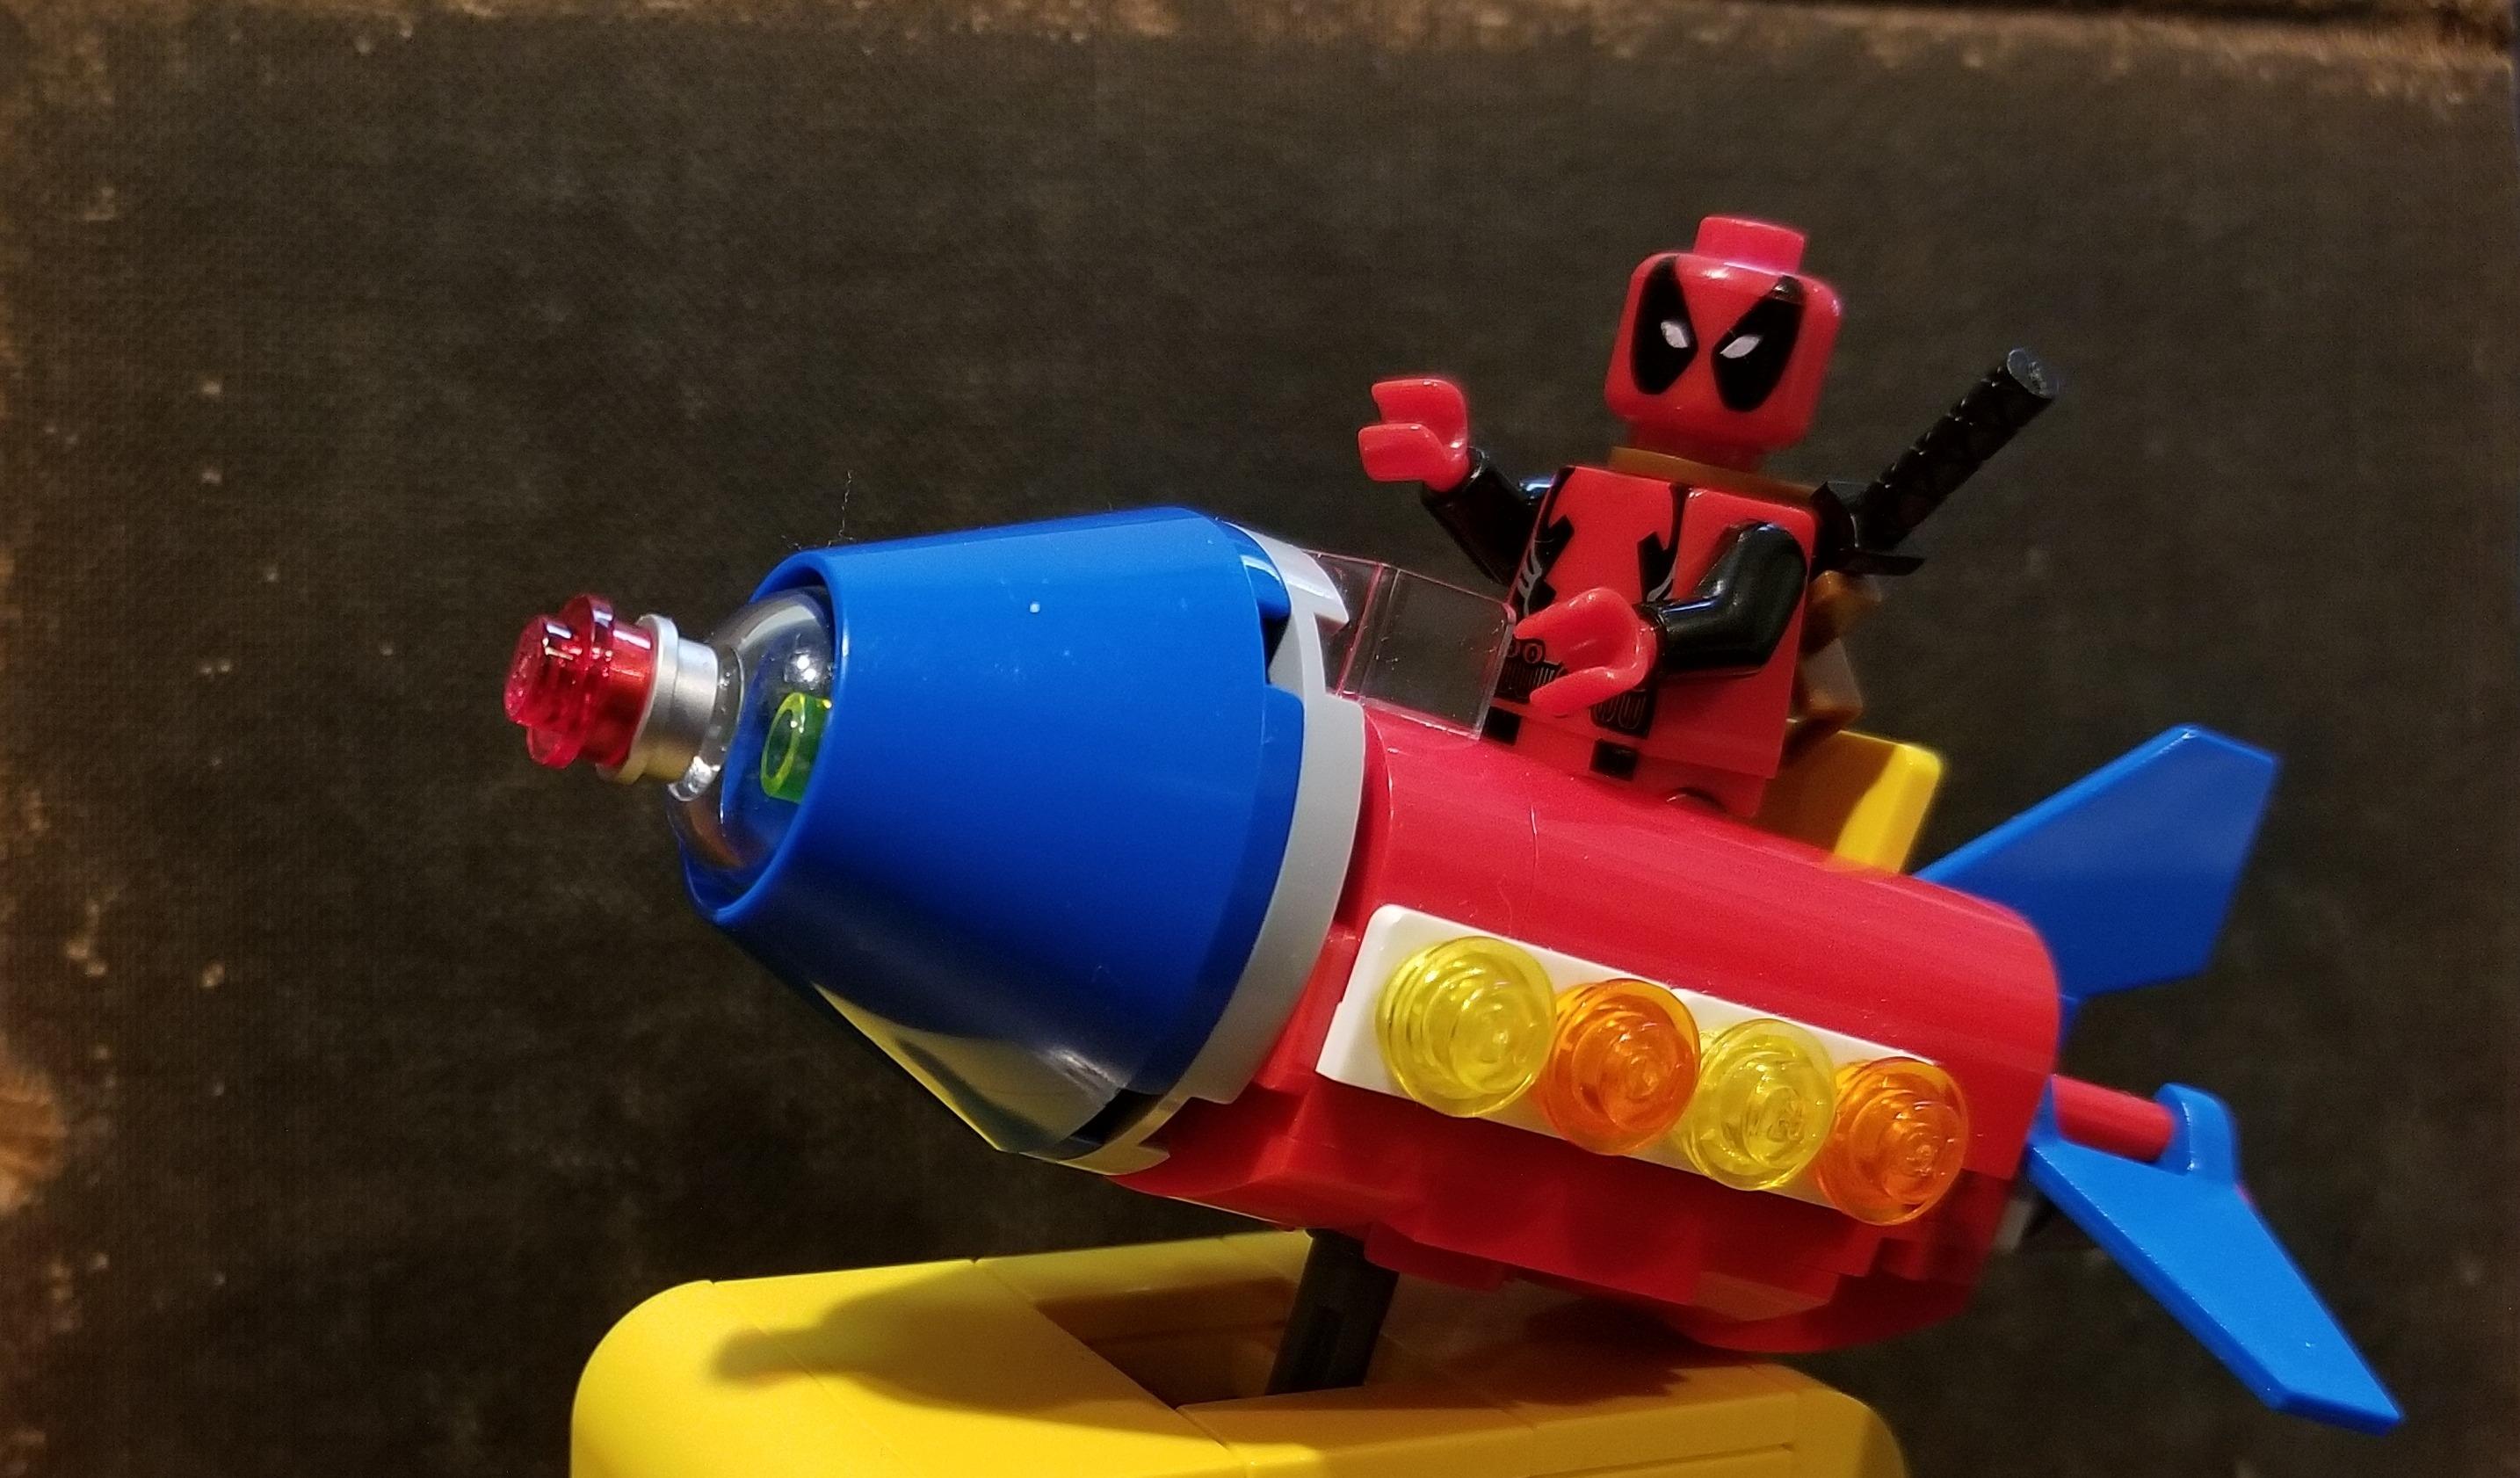 Lego Deadpool on a Rocket Ride